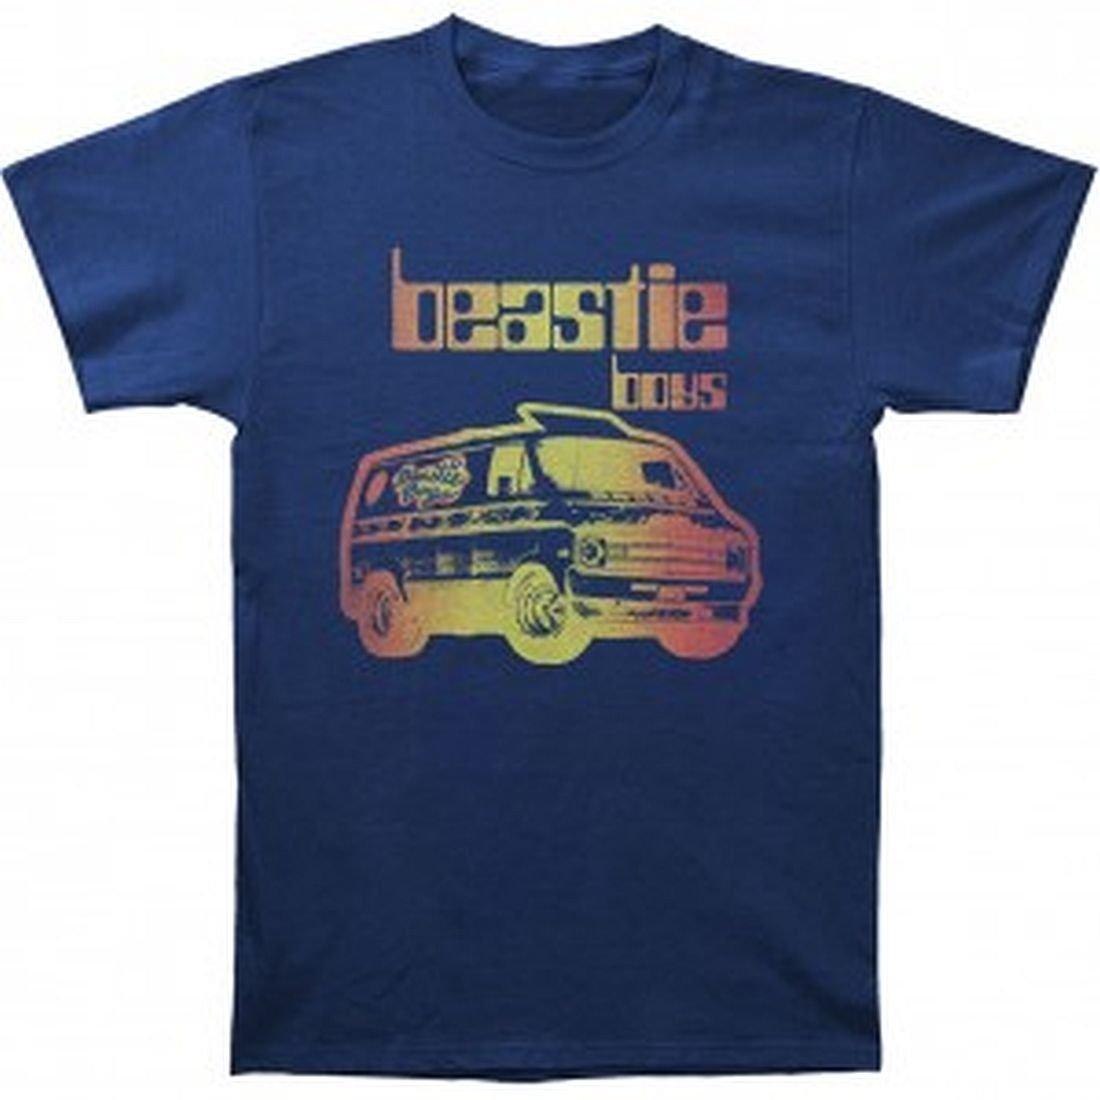 Ill Rock Merch Men's Beastie Boys Van Art T-Shirt